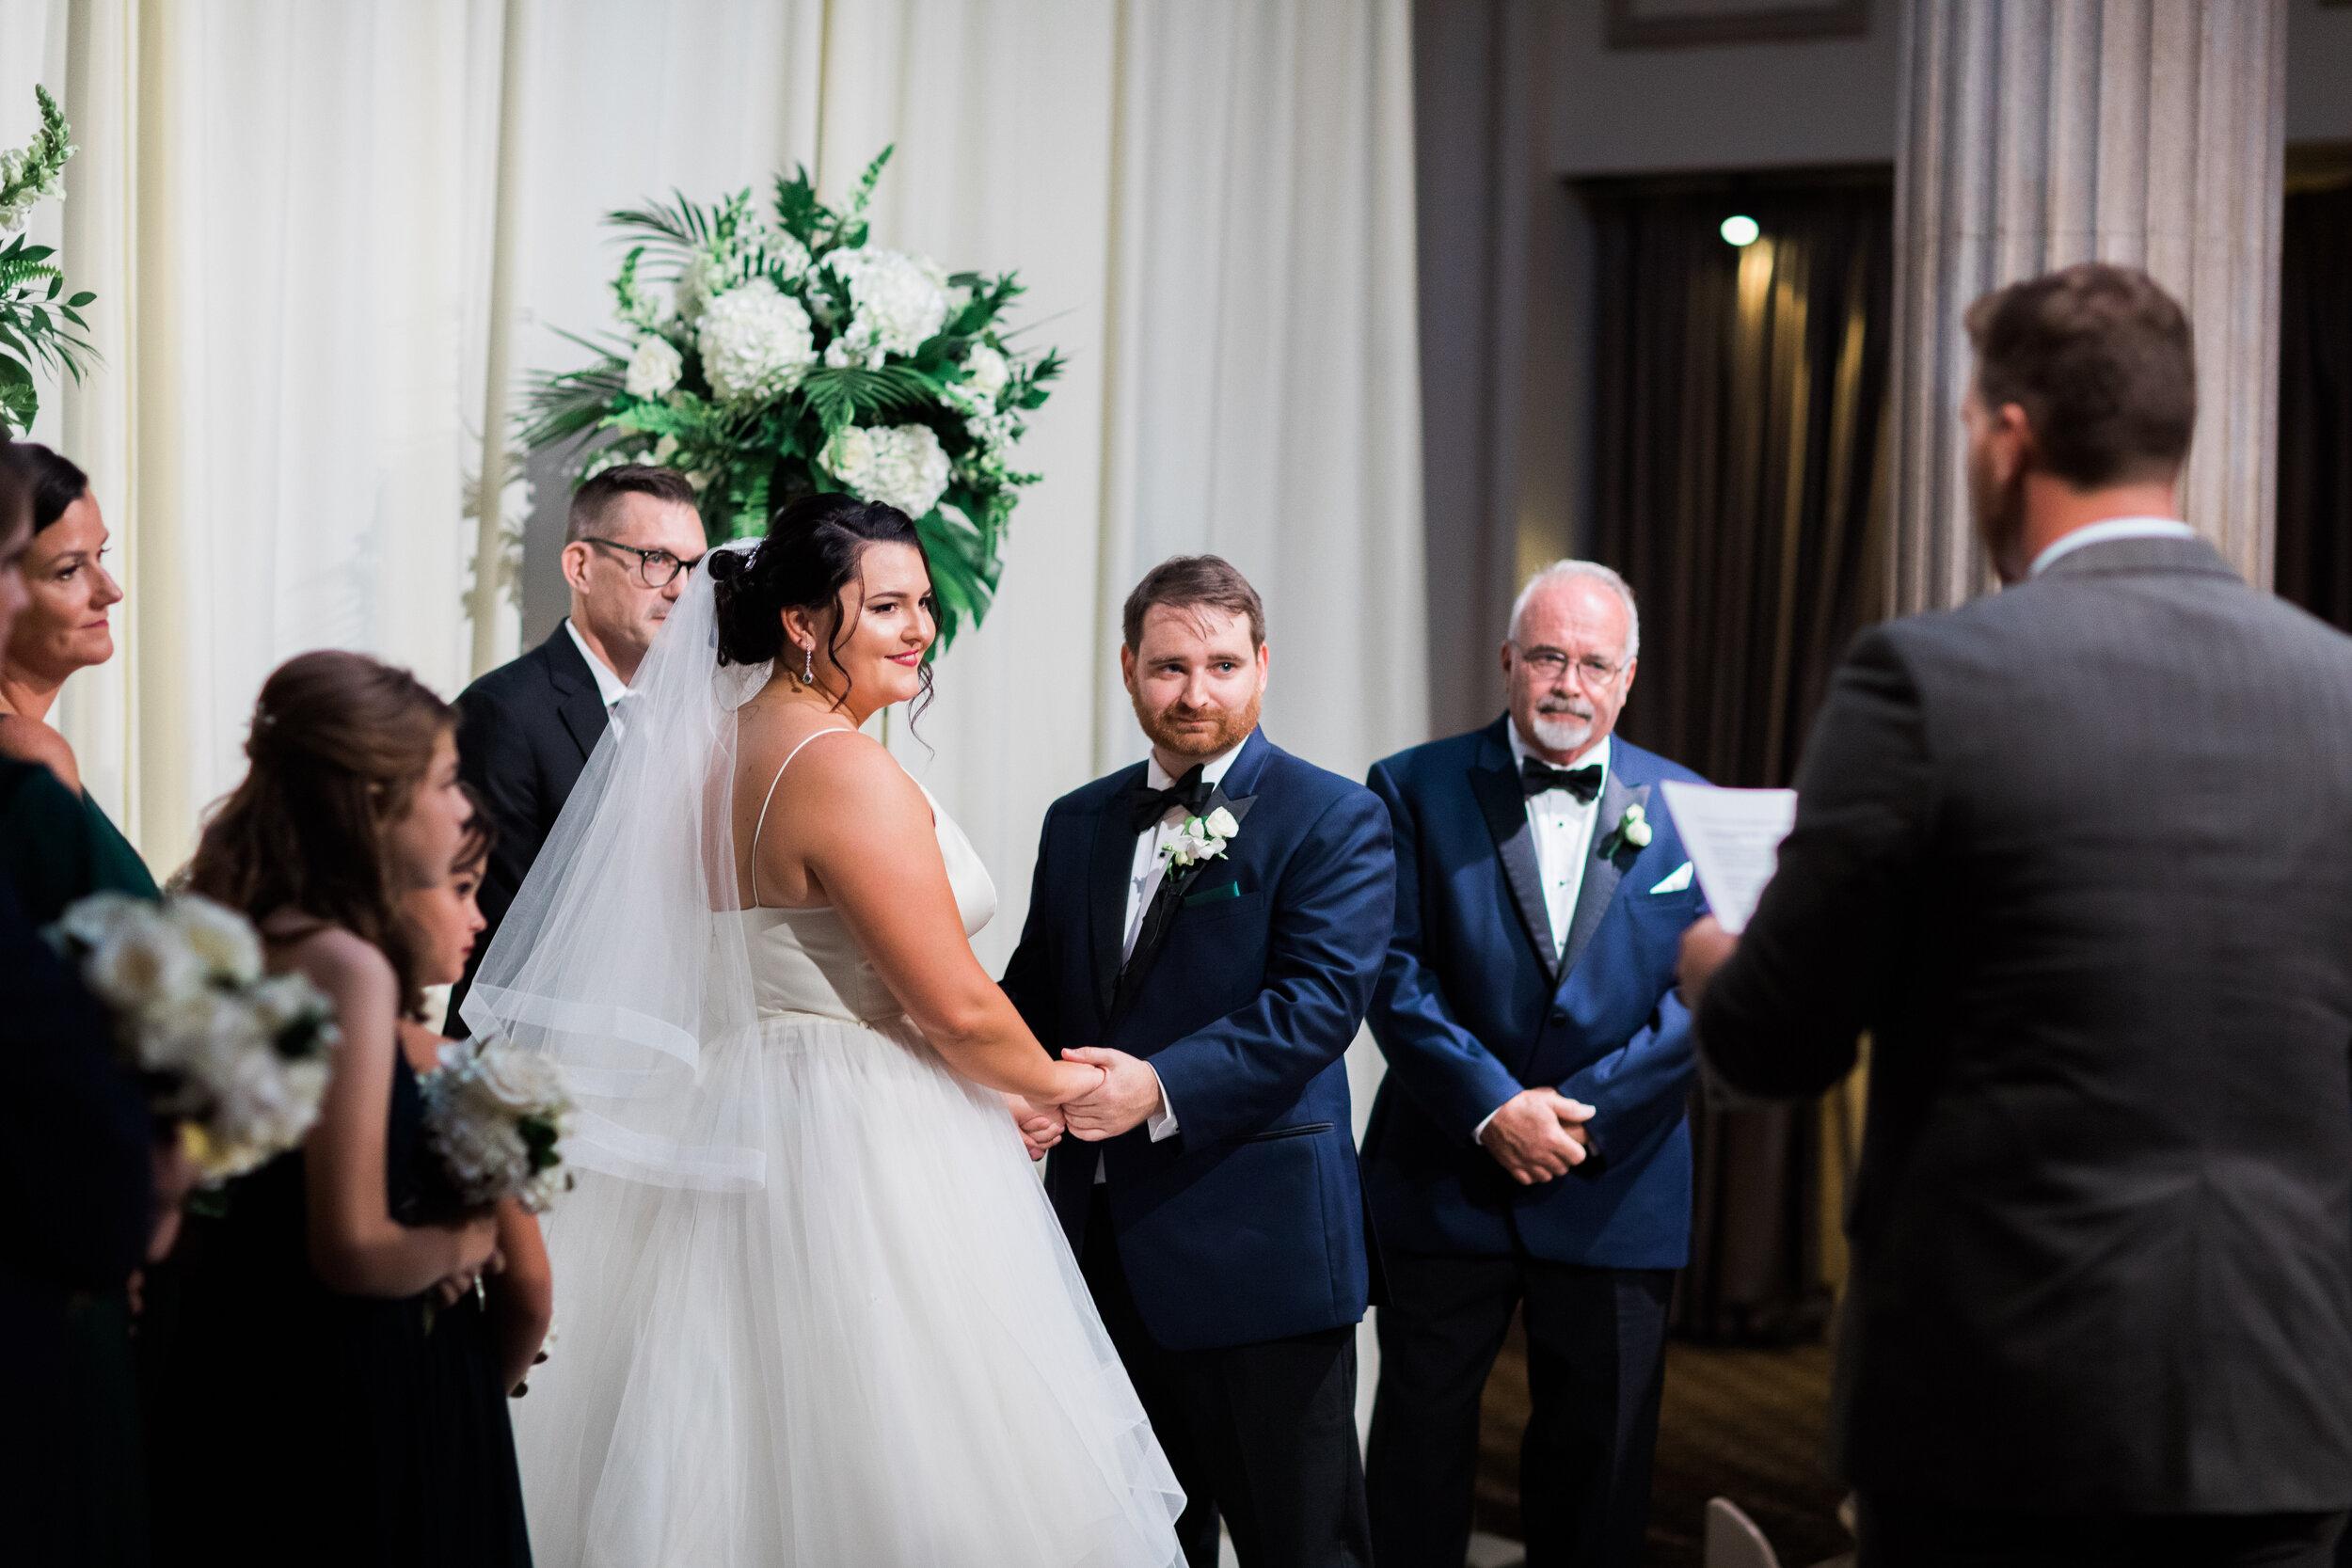 St_Augustine_Wedding_Photography_Treasury_on_the_Plaza_Wedding__0028_.jpg